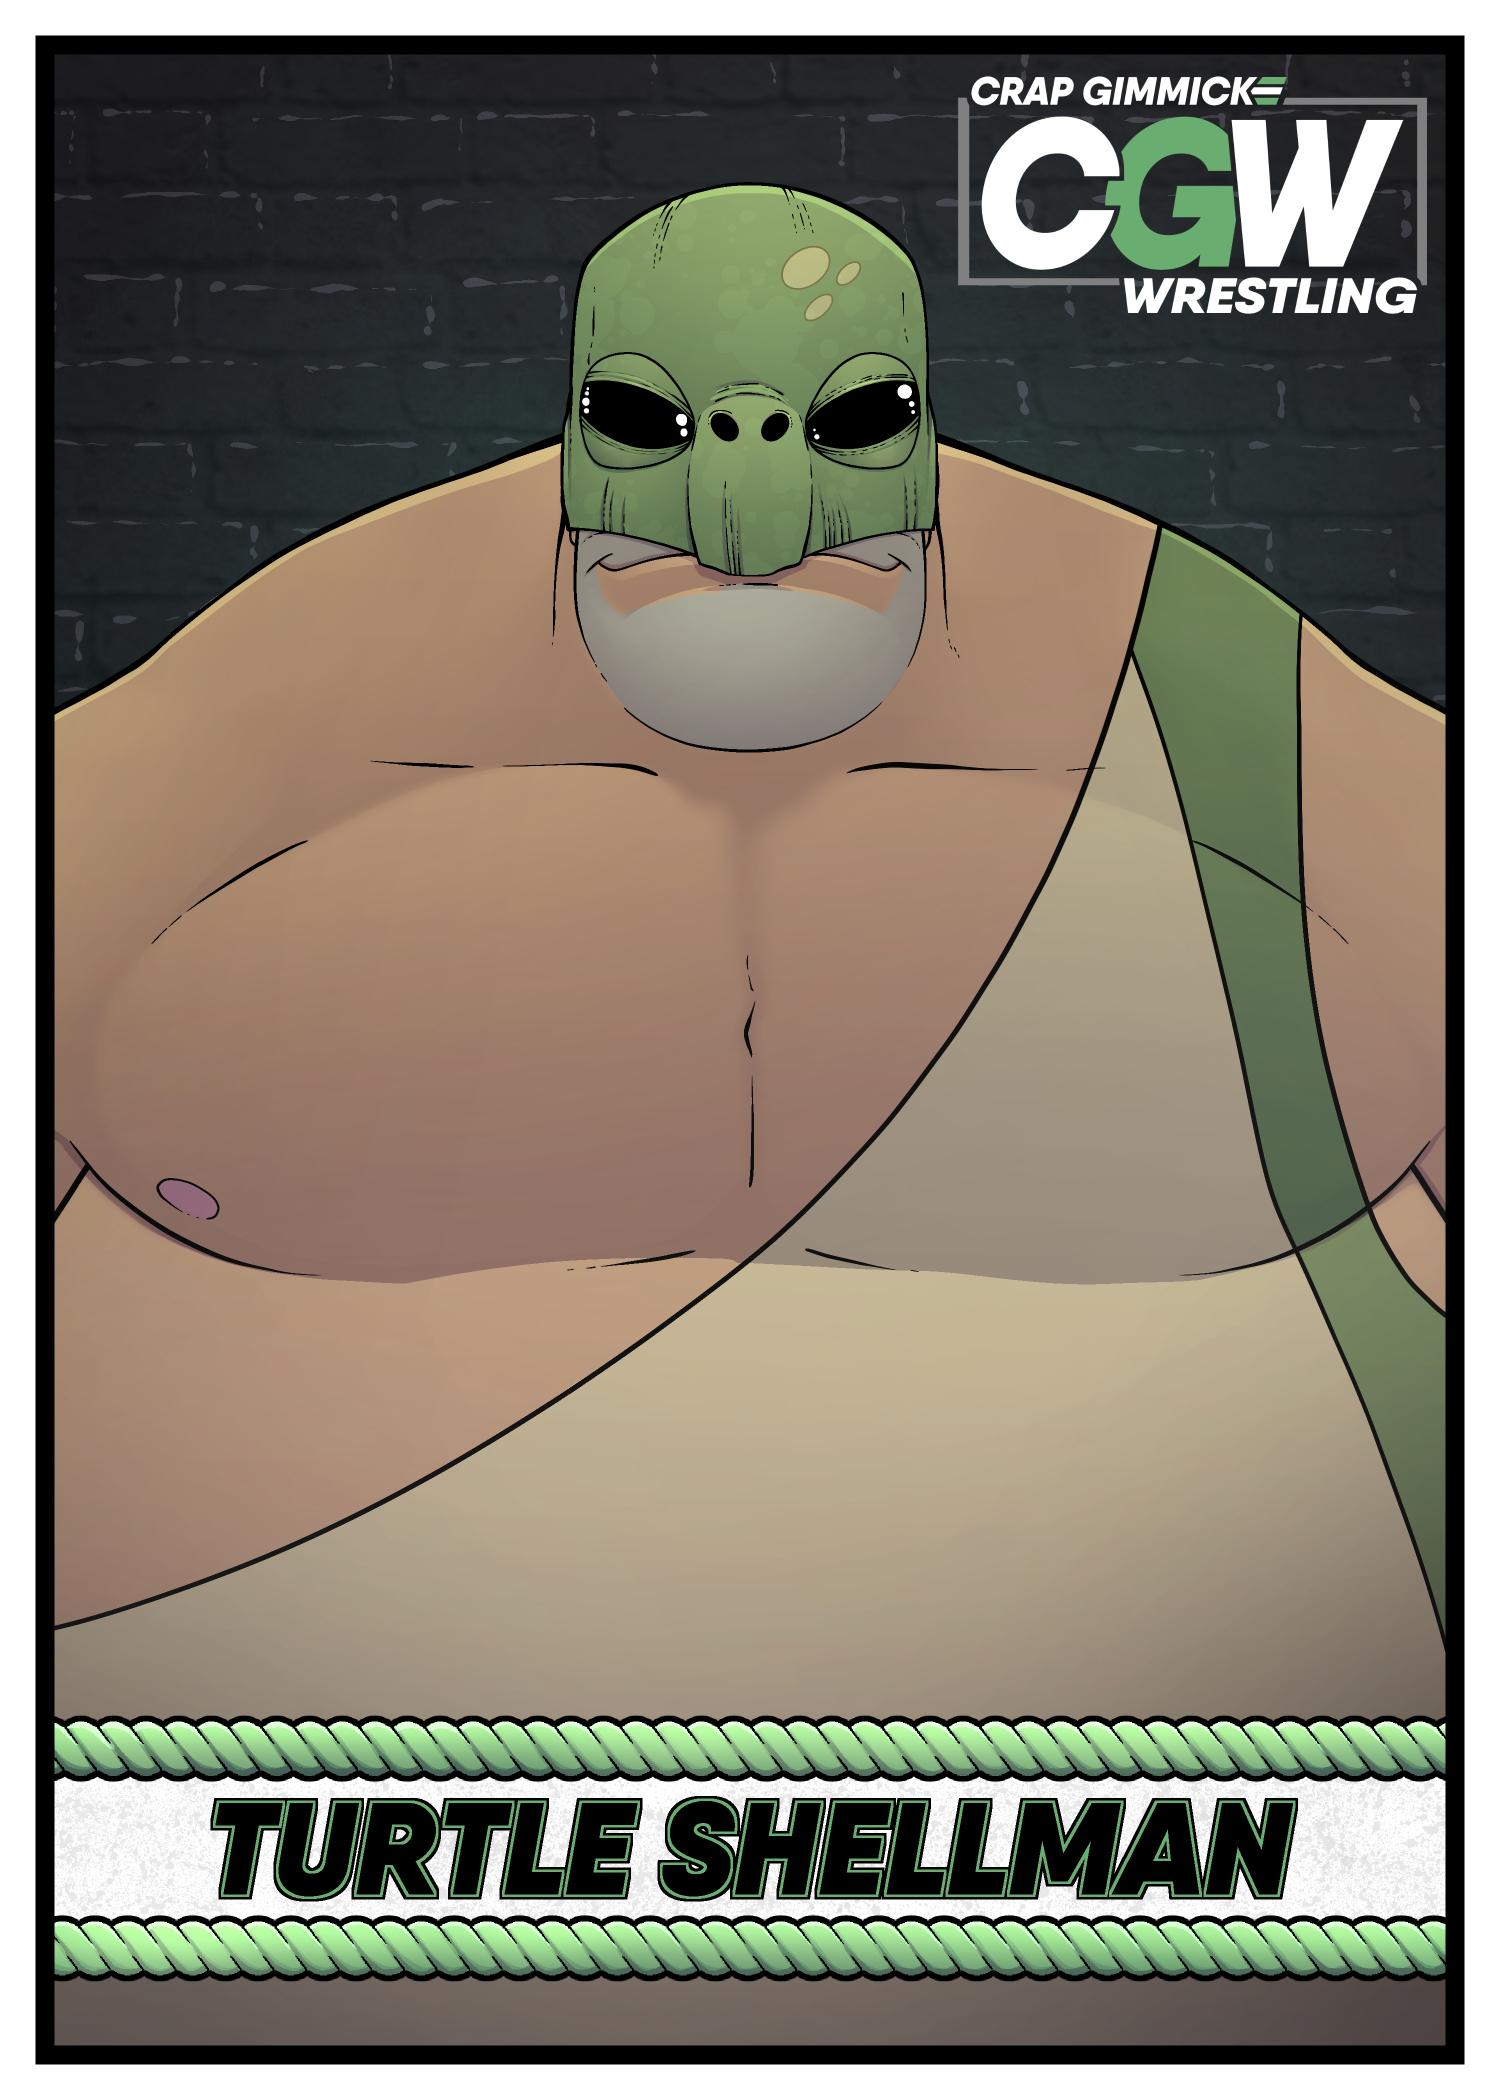 Turtle Shellman